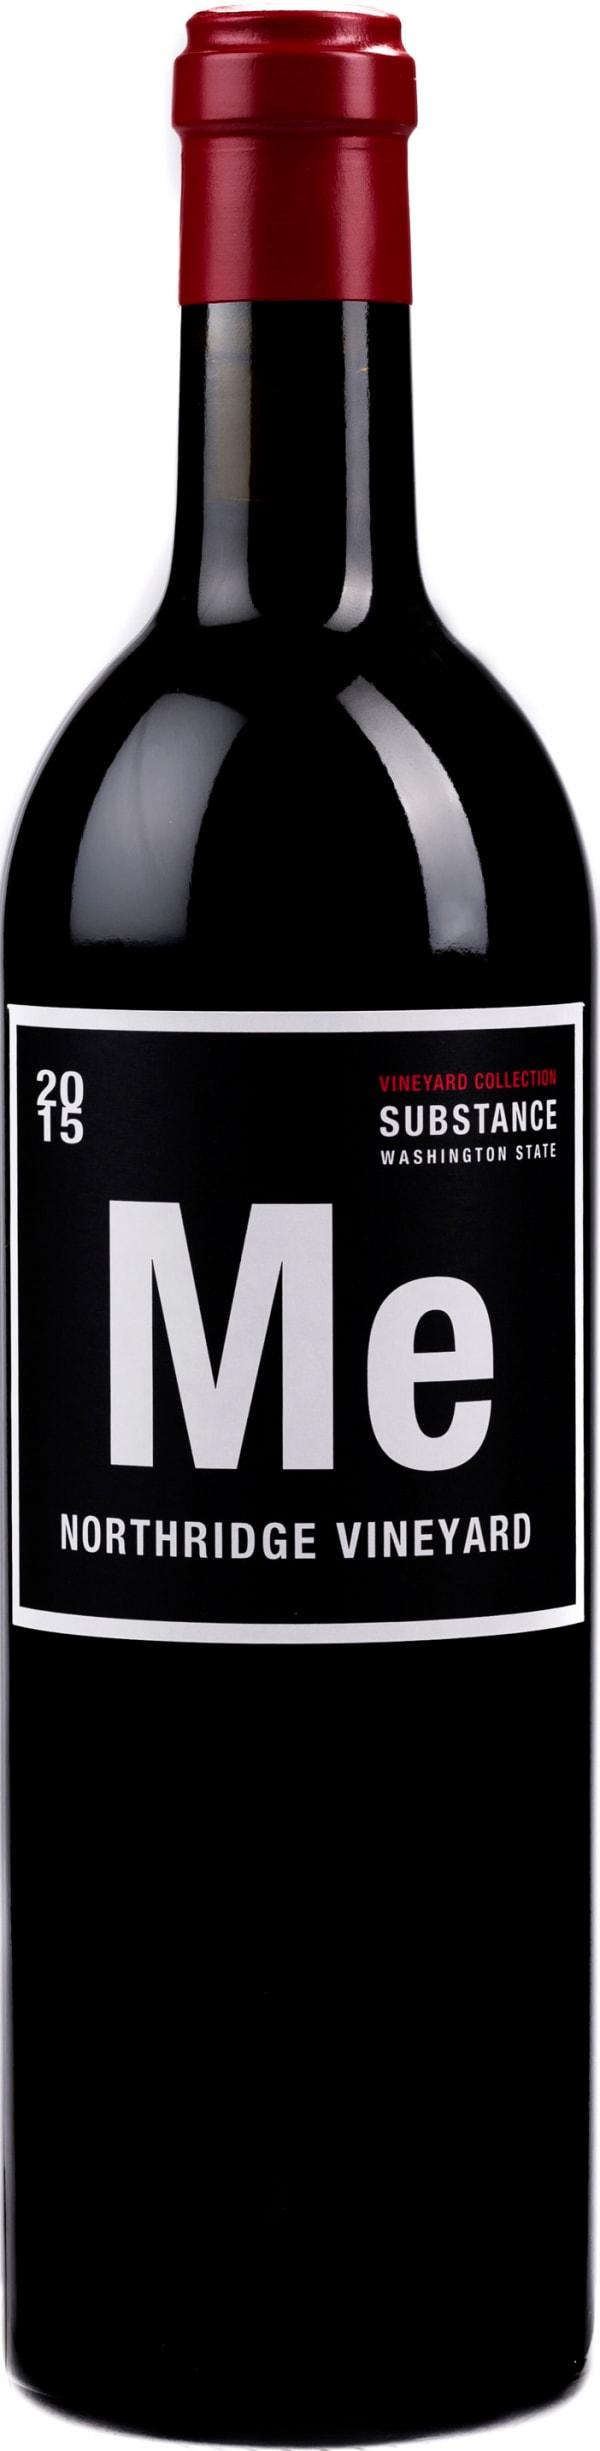 Substance Vineyard Collection Northridge Vineyard Merlot 2015